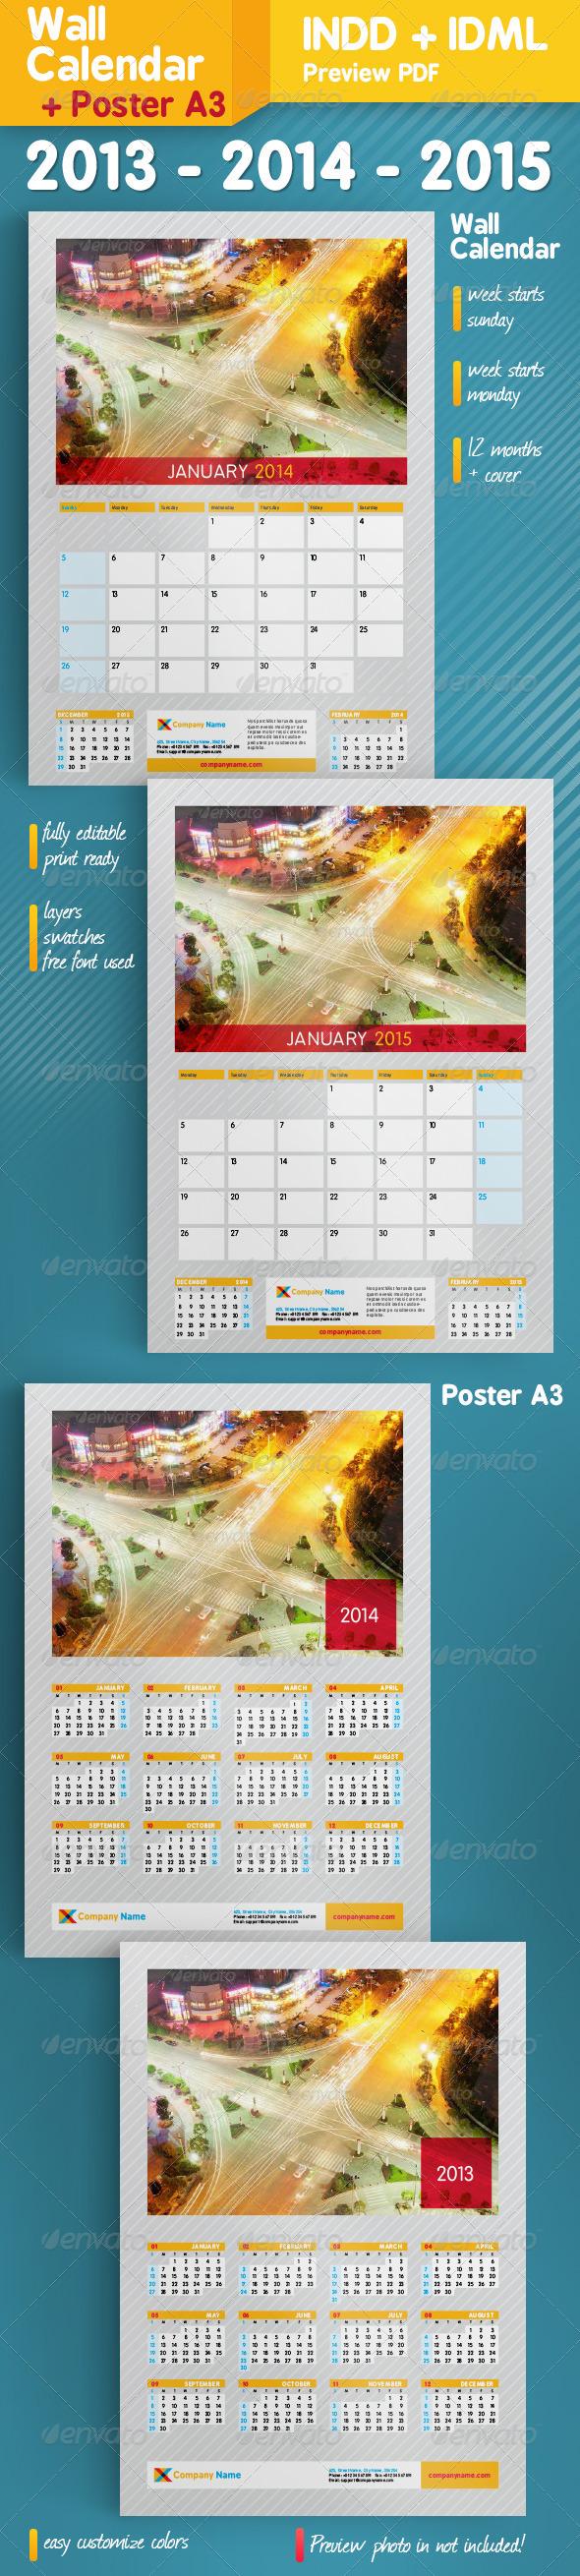 GraphicRiver Wall Calendar & Poster A3 2013-2014-2015 5313778